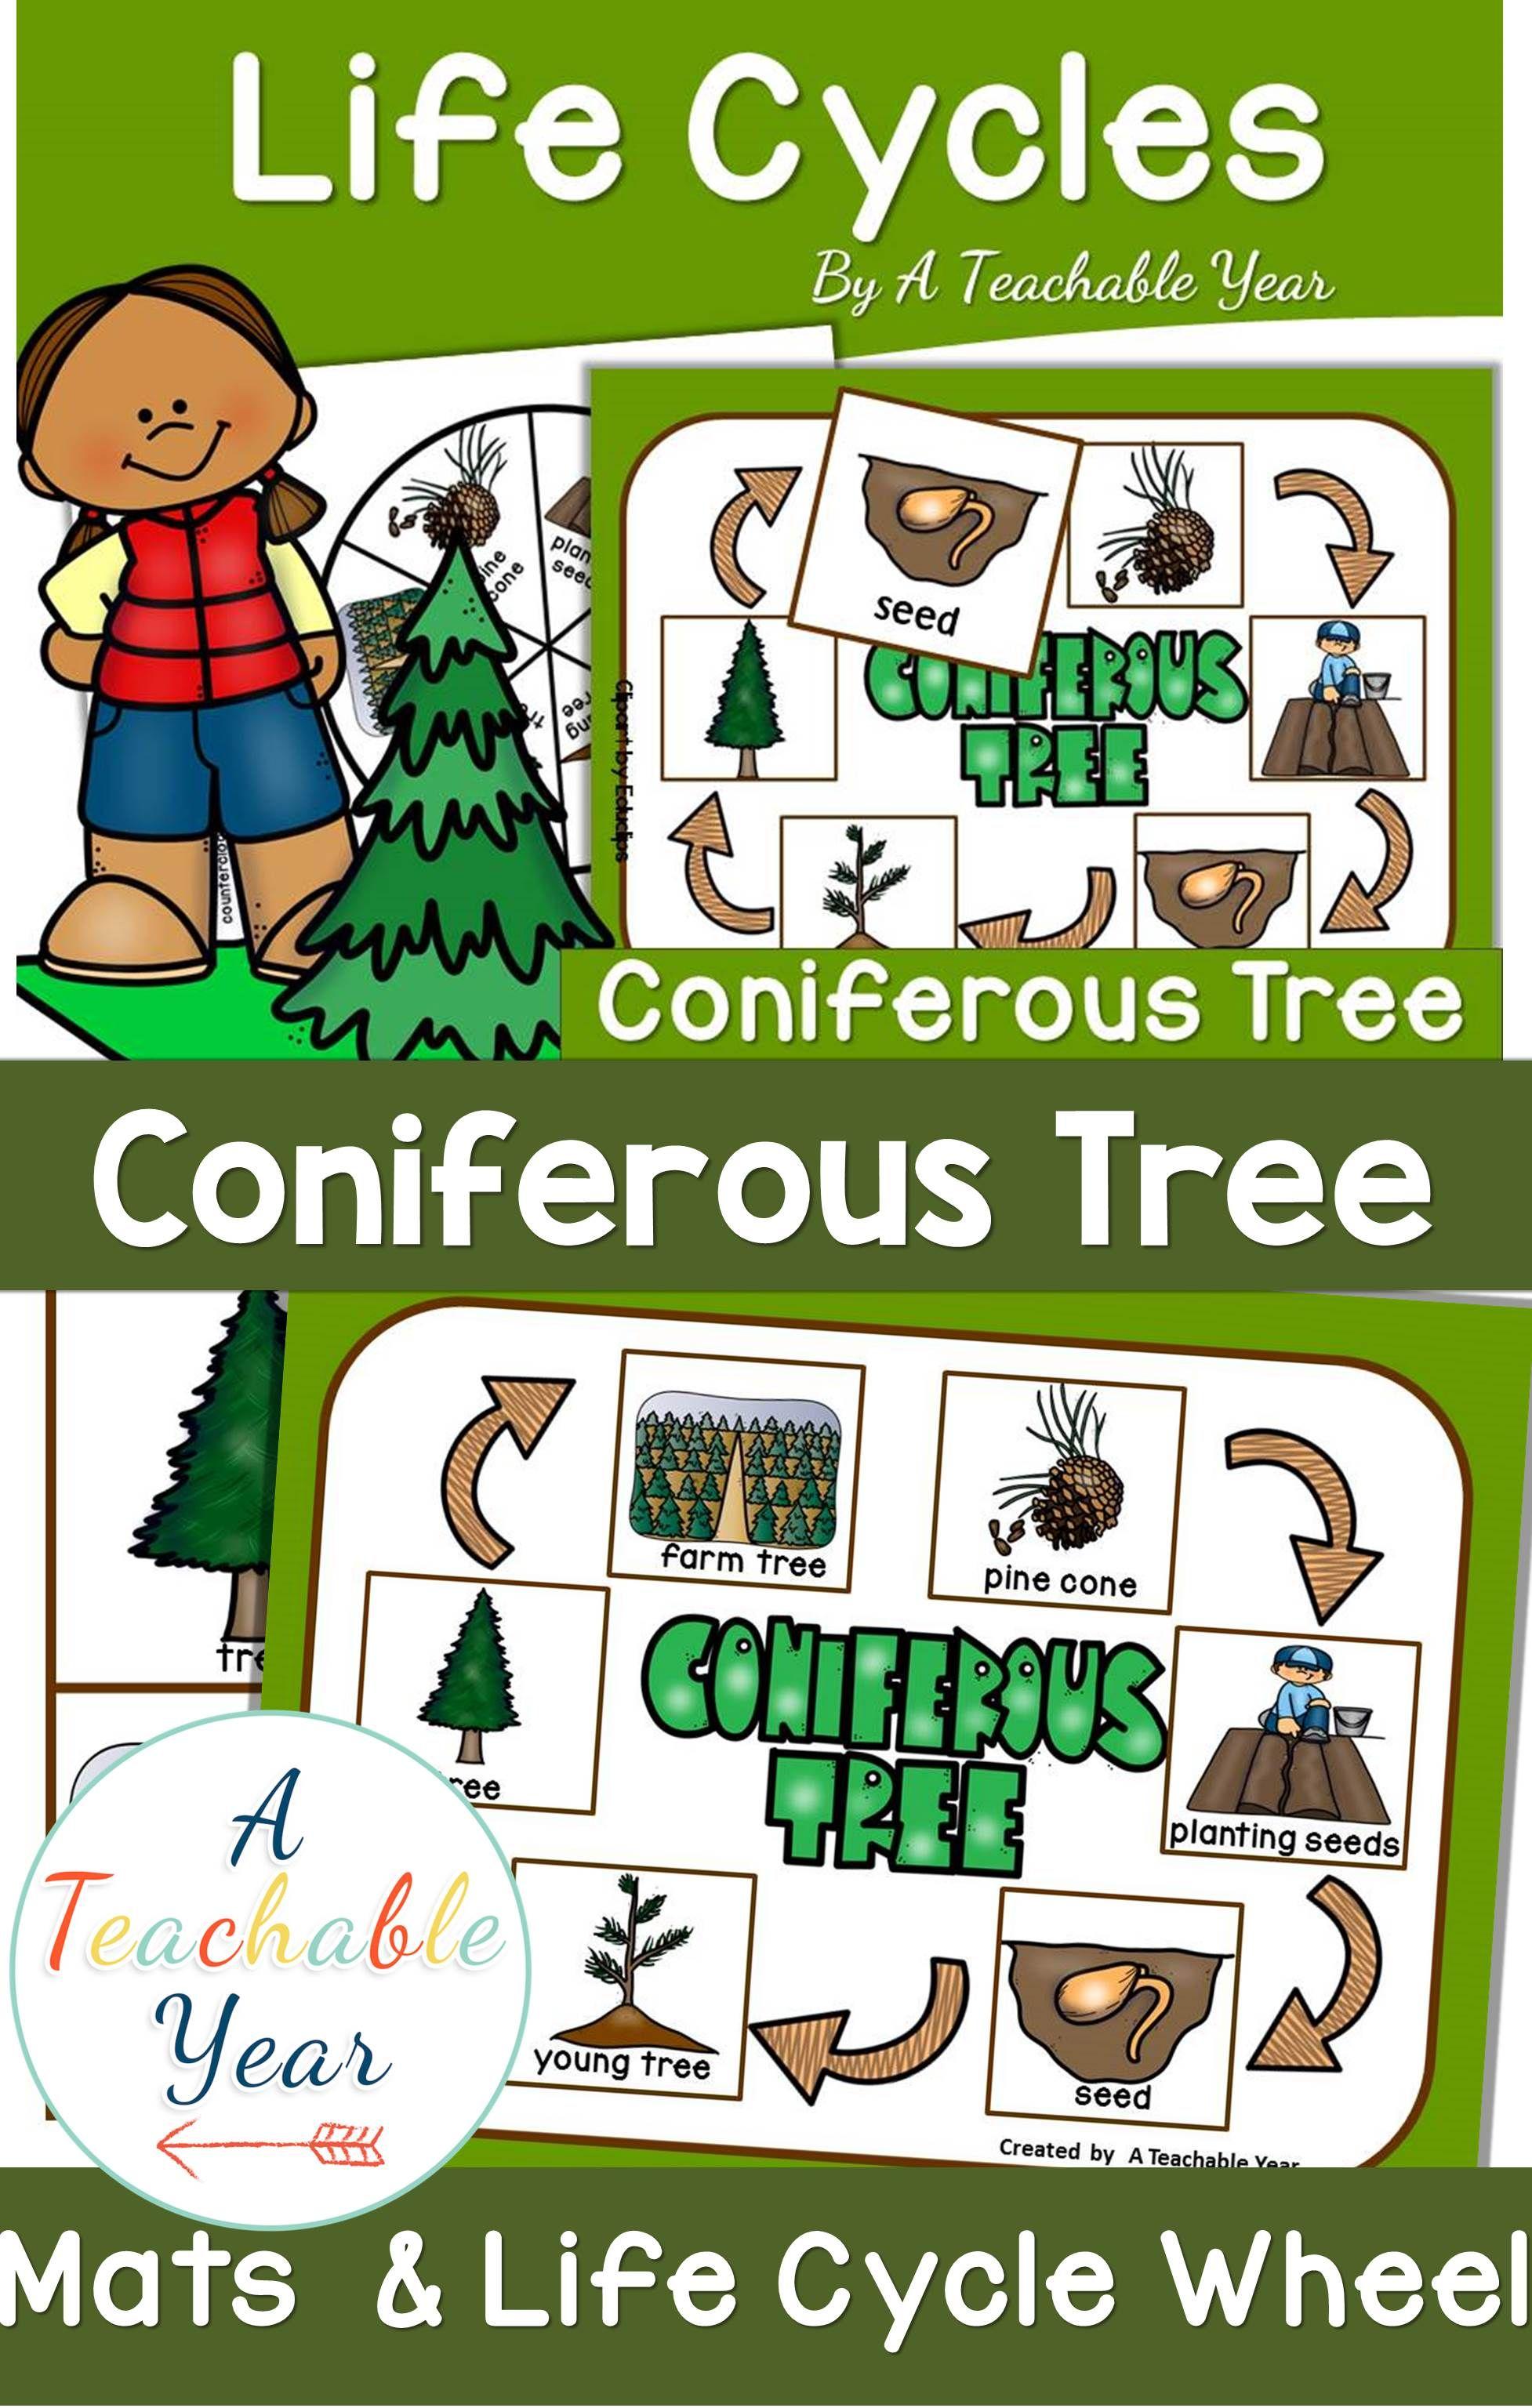 Coniferous Tree Life Cycle Activities